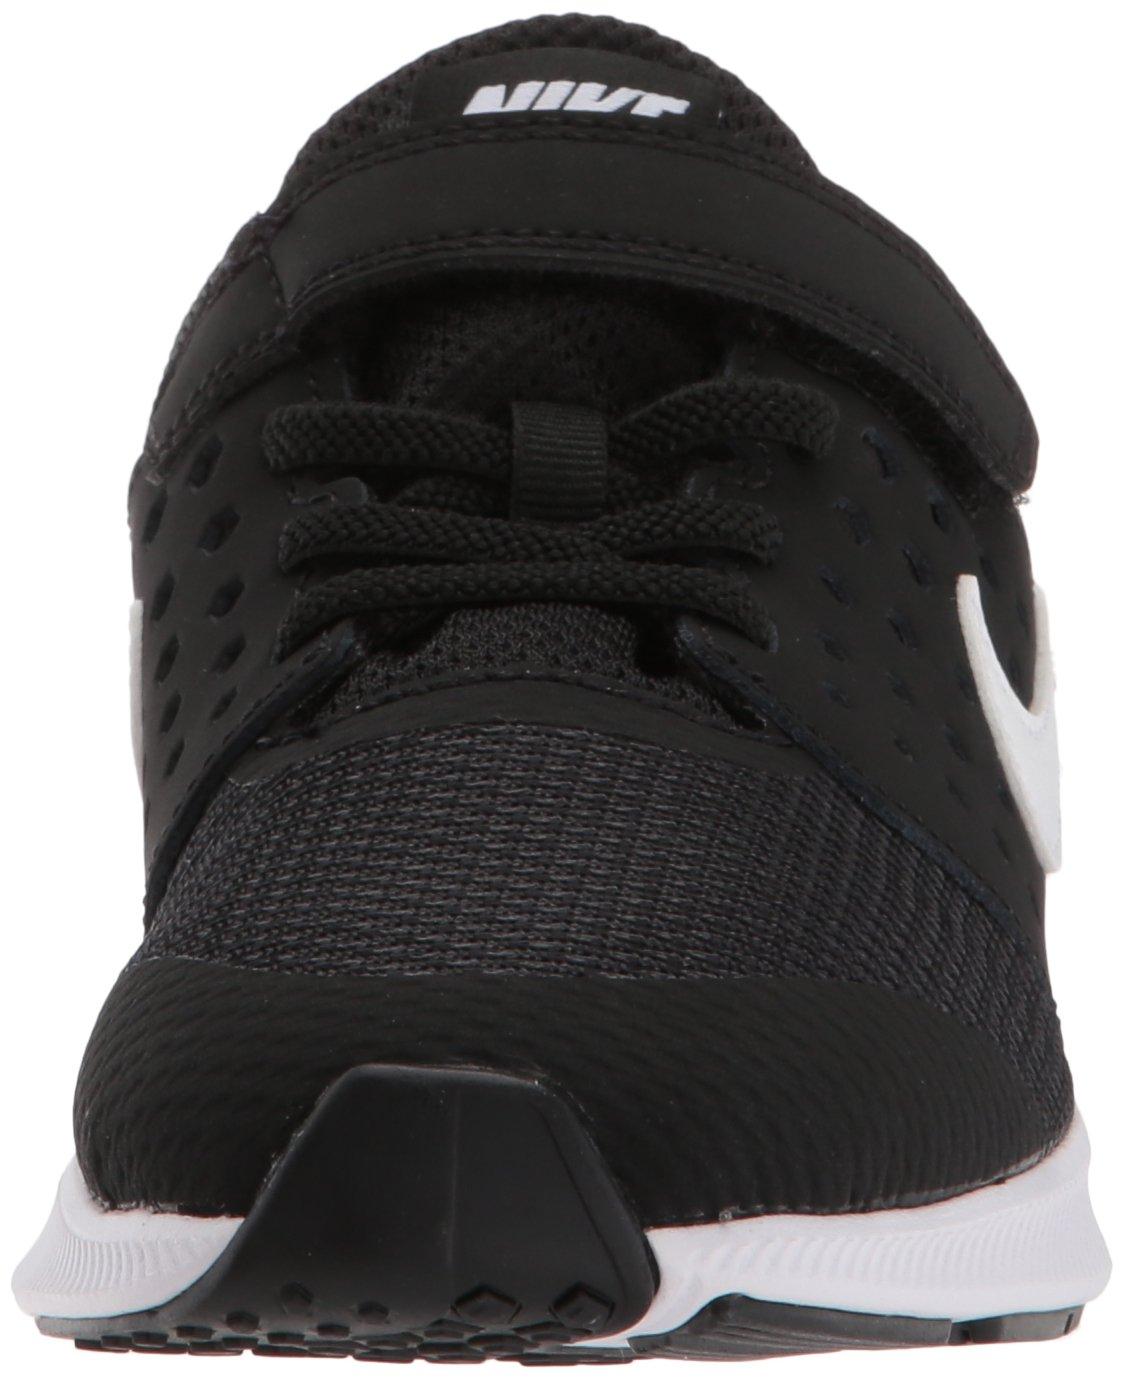 Nike Boys' Downshifter 7 (PSV) Running Shoe, Black/White-Anthracite, 3 M US Little Kid by Nike (Image #4)